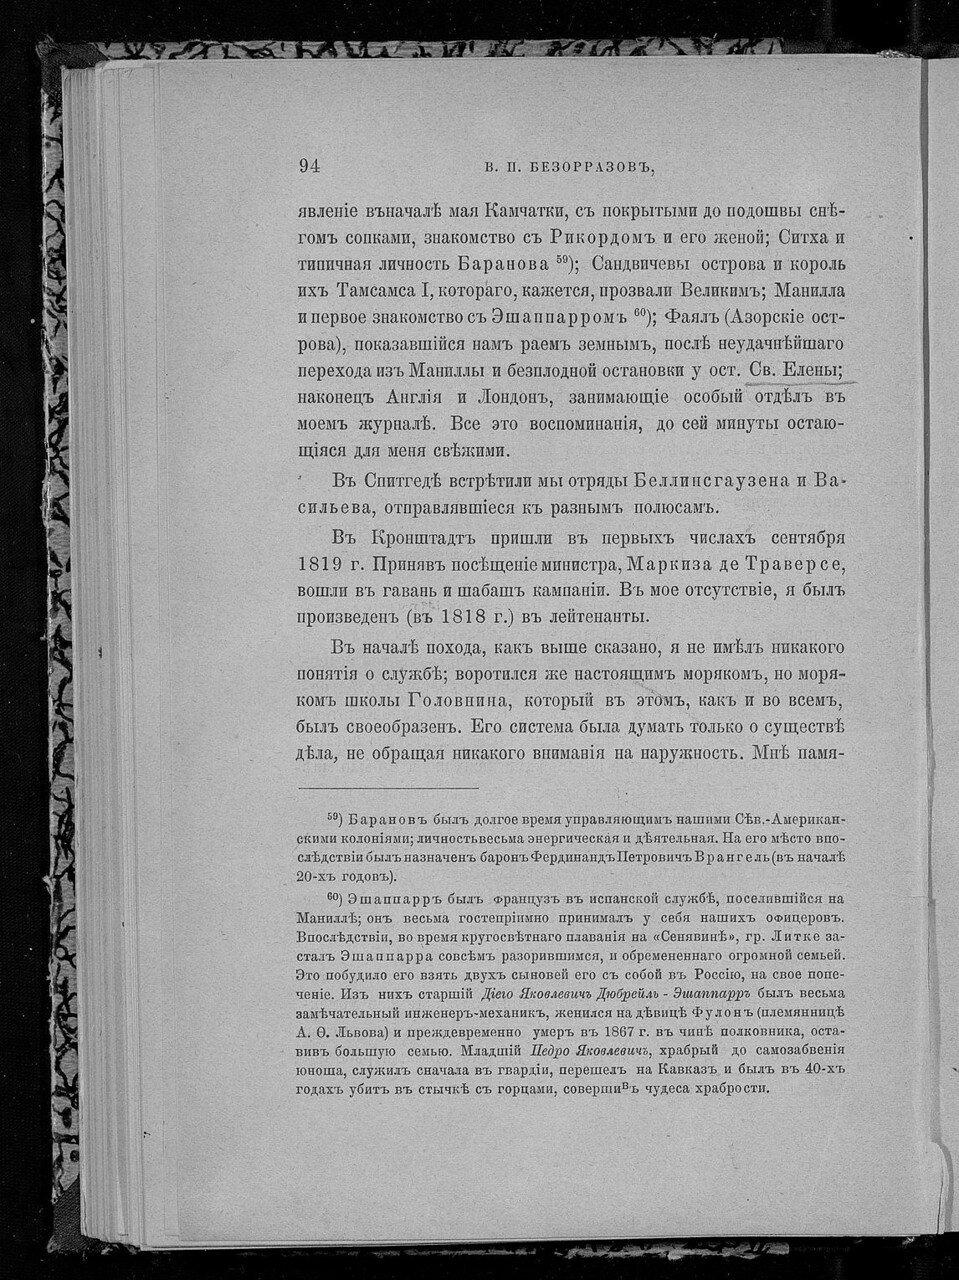 https://img-fotki.yandex.ru/get/516848/199368979.d5/0_21ddfd_bbd96981_XXXL.jpg